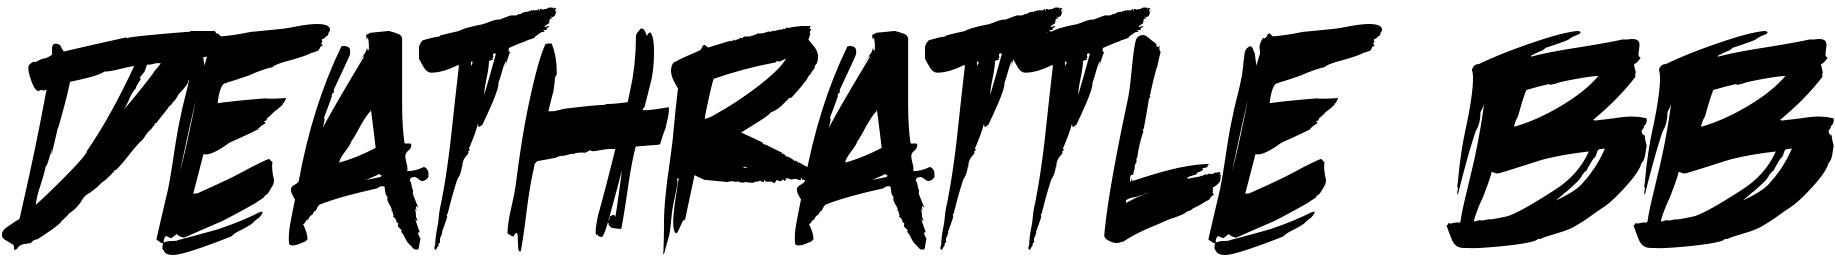 DeathRattle BB